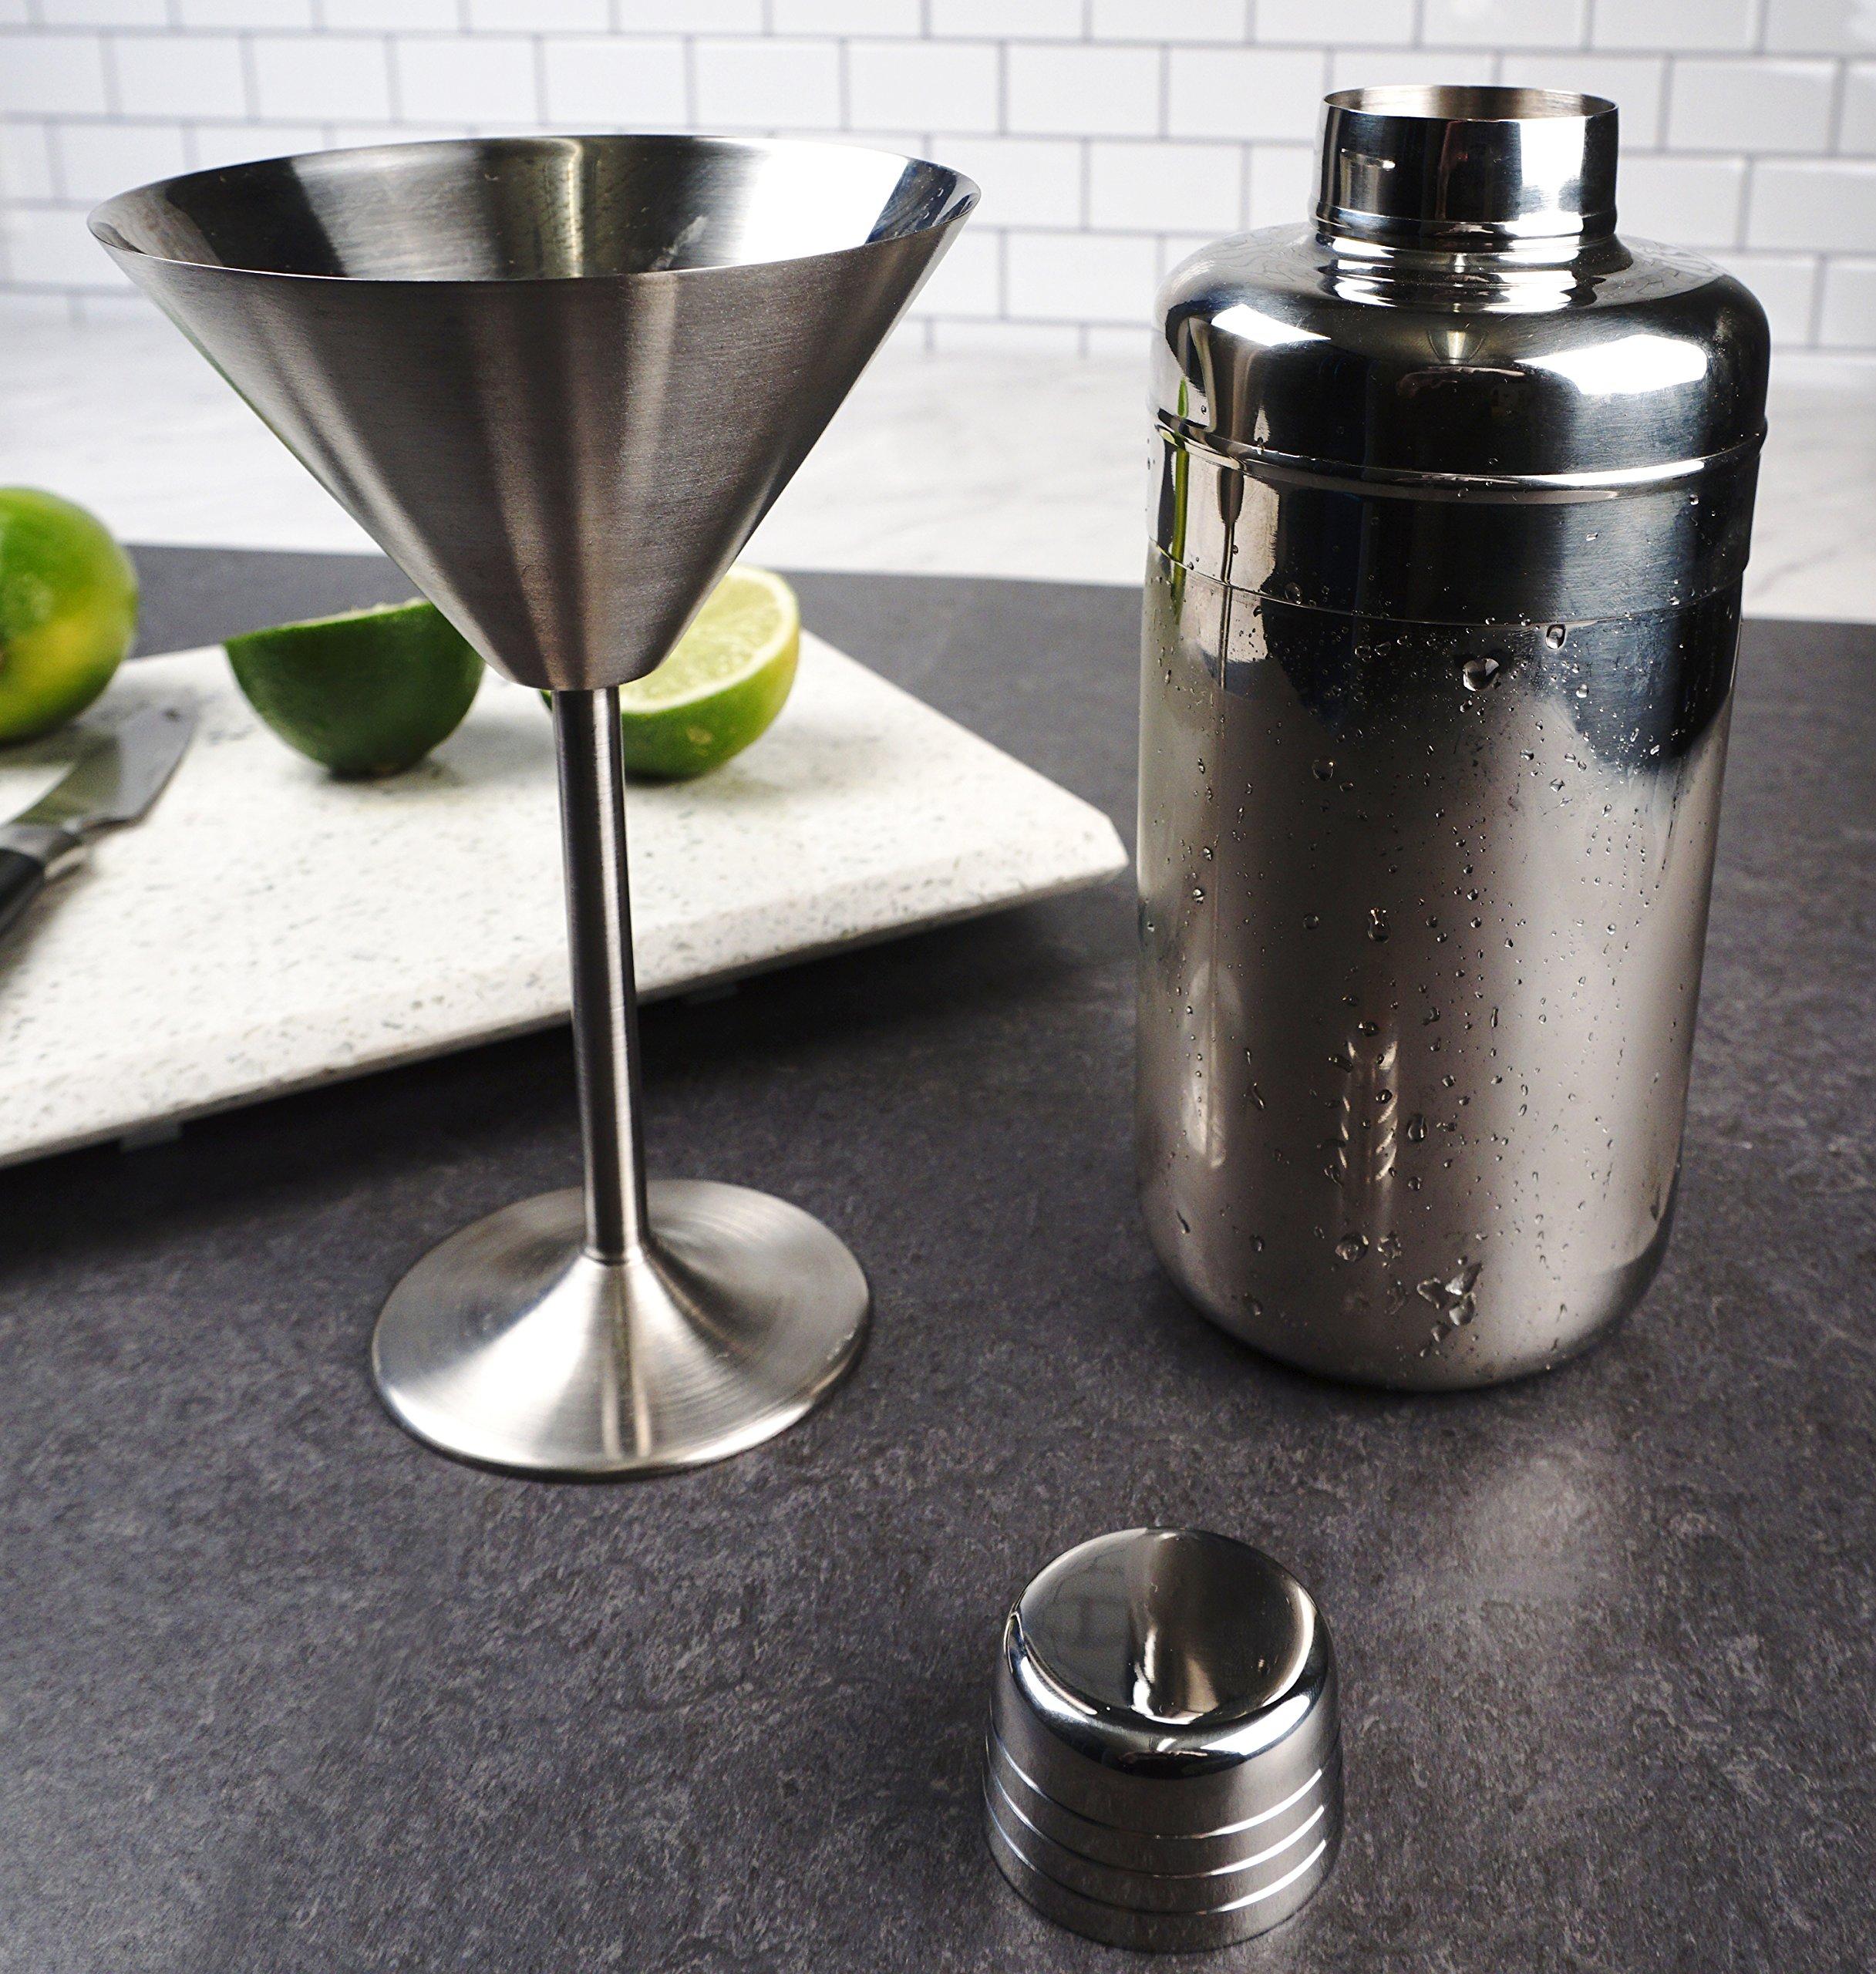 RSVP Endurance Stainless Steel Martini Glasses, Set of 2